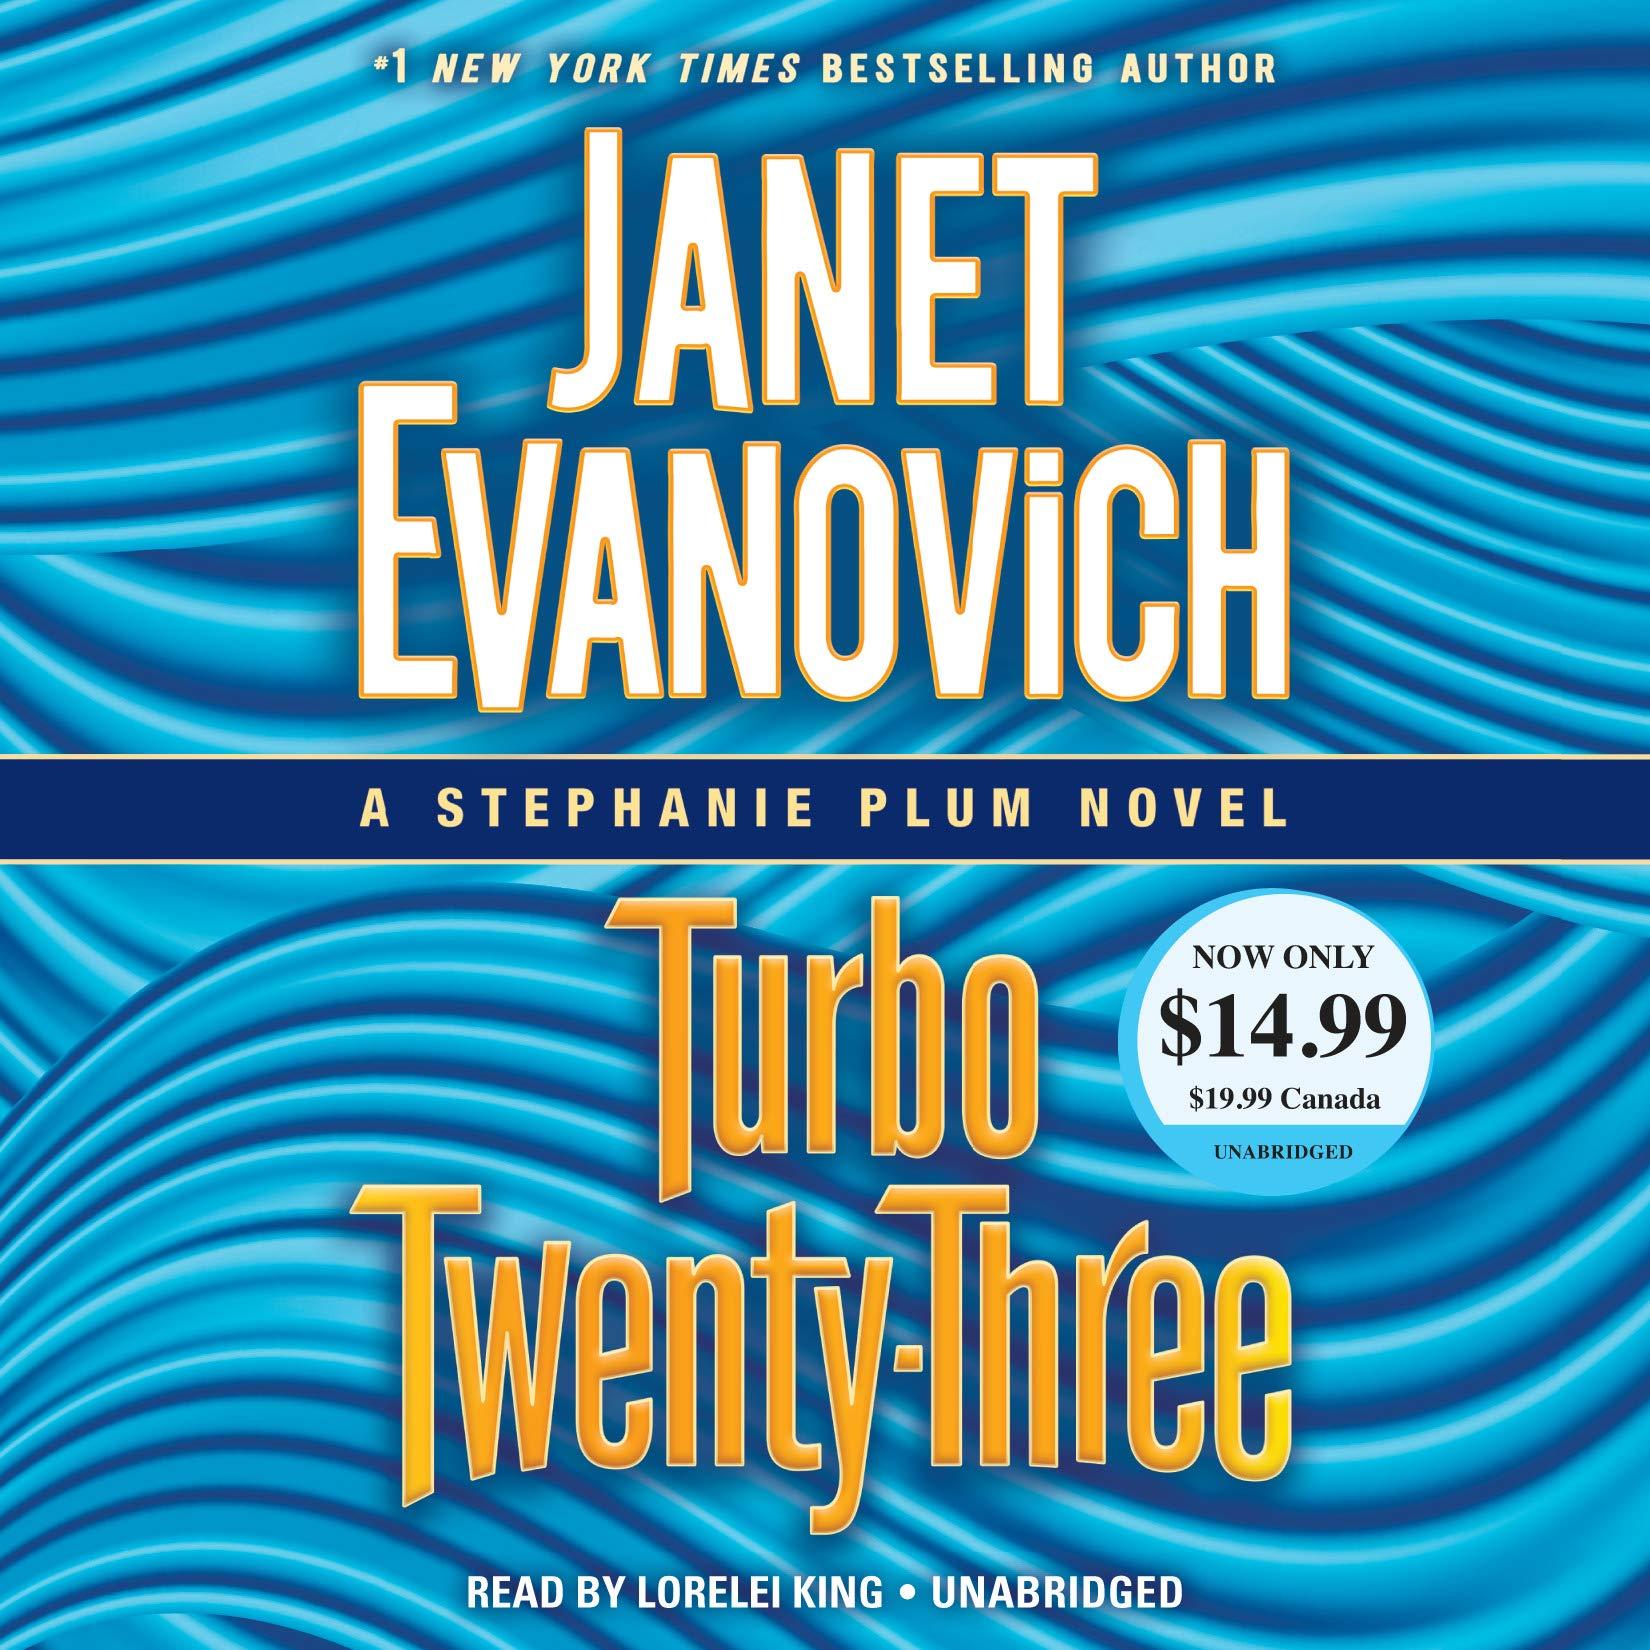 Turbo Twenty-Three: A Stephanie Plum Novel: Janet Evanovich, Lorelei King: 9781984883483: Amazon.com: Books